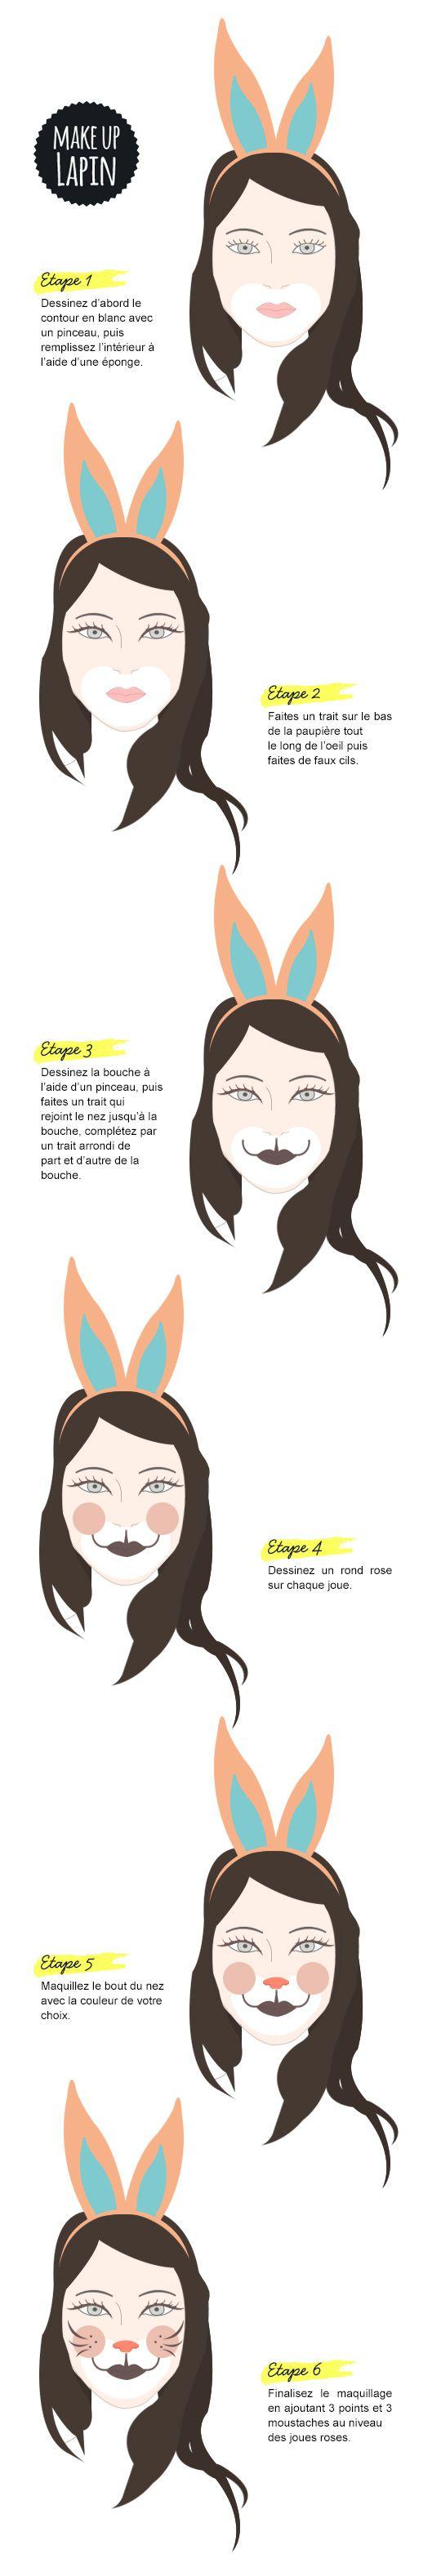 Etapes maquillage lapin par Peek It magazine